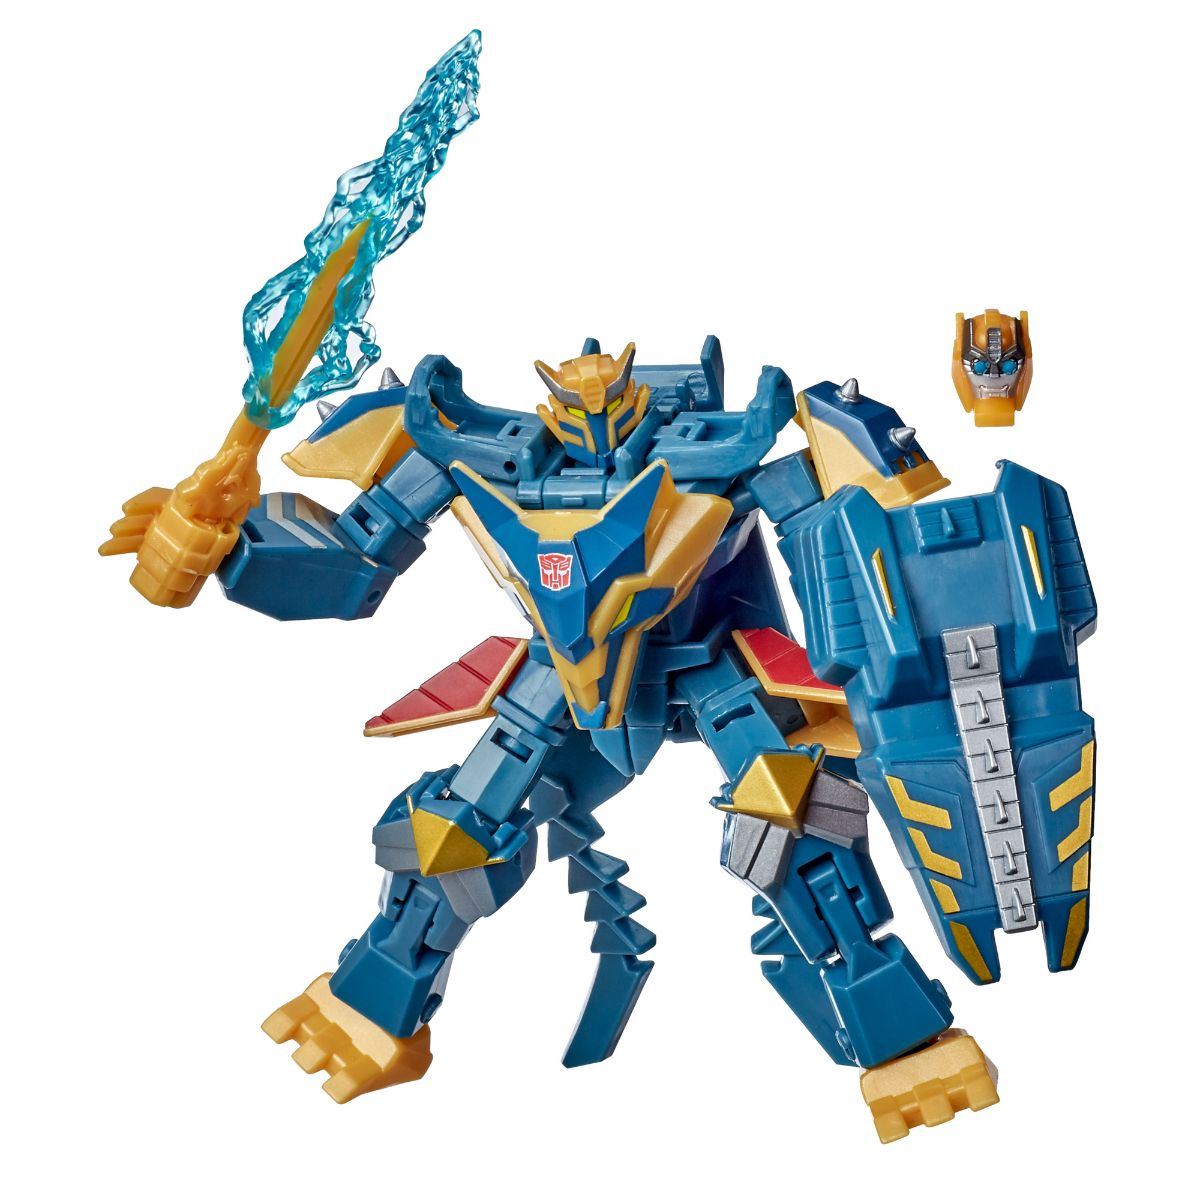 Figurina Transformers Cyberverse Deluxe, Thunderhowl, E71035